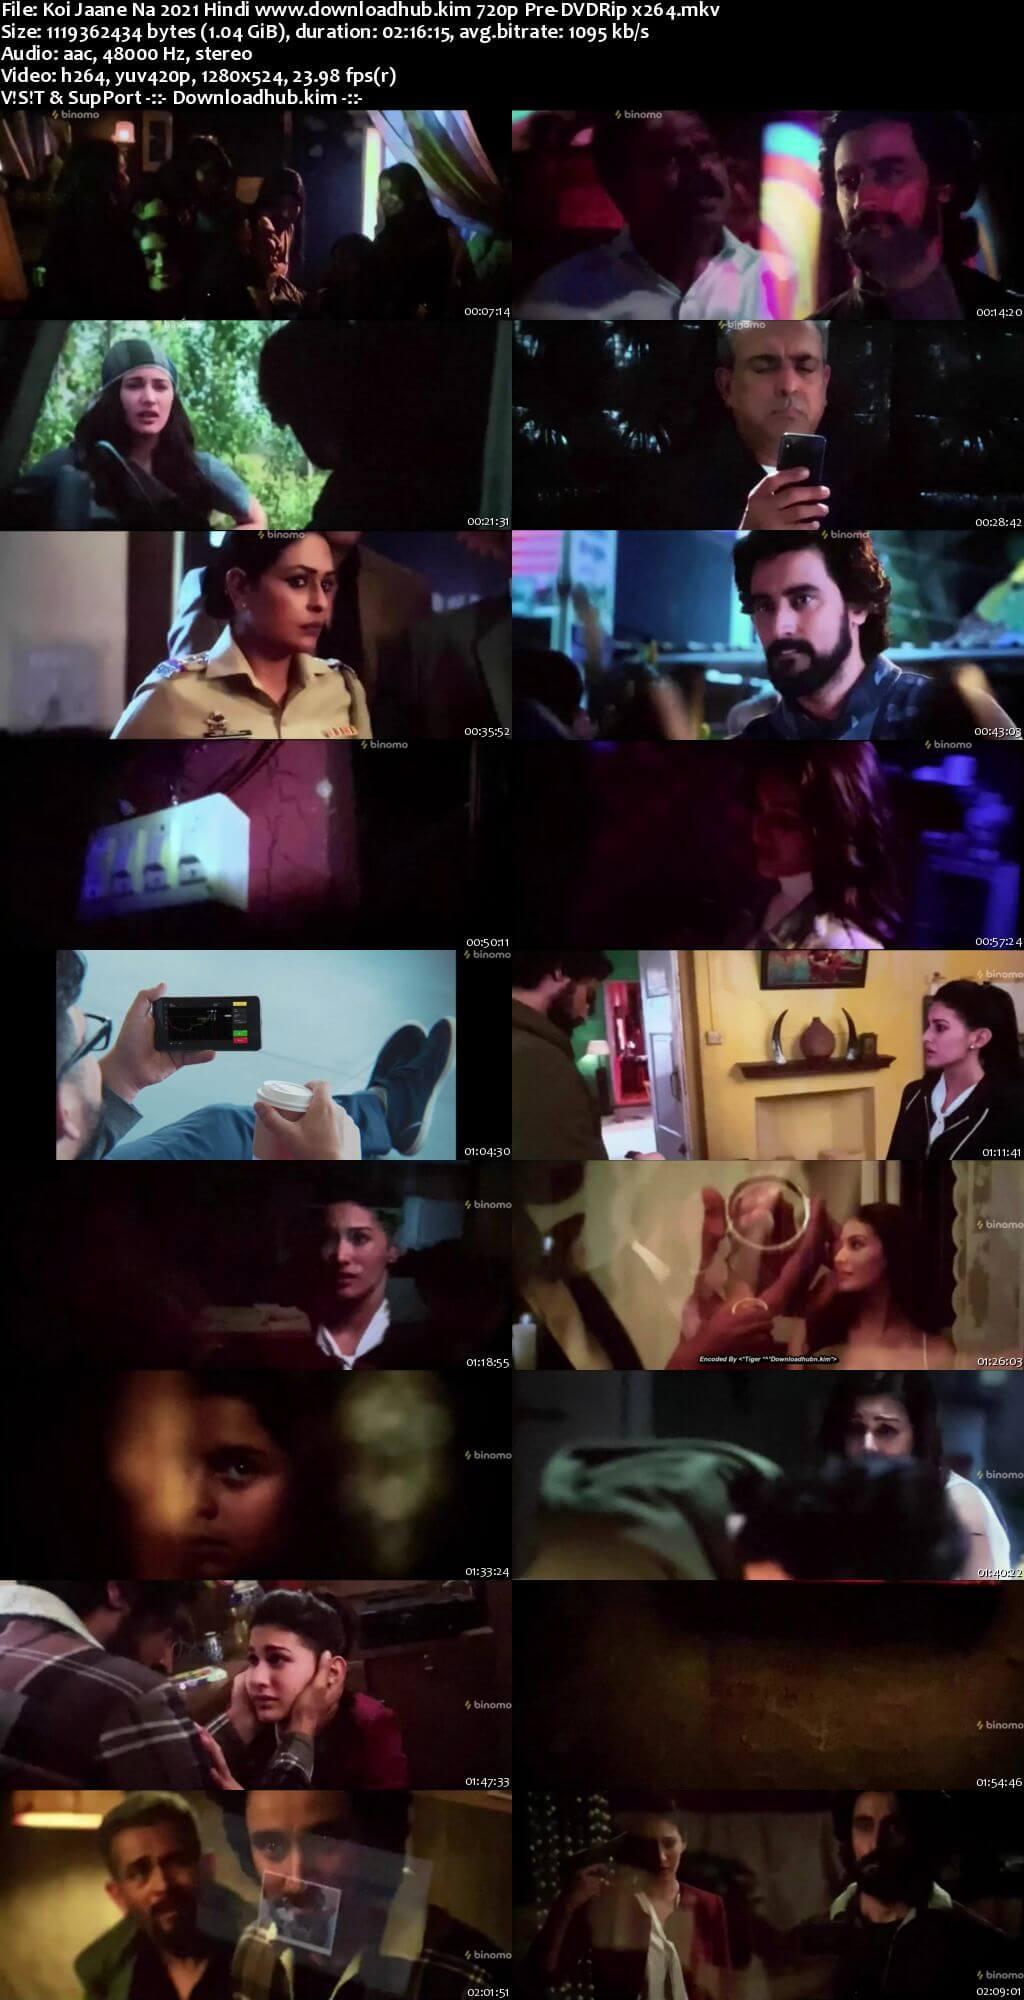 Koi Jaane Na 2021 Hindi 720p 480p Pre-DVDRip x264